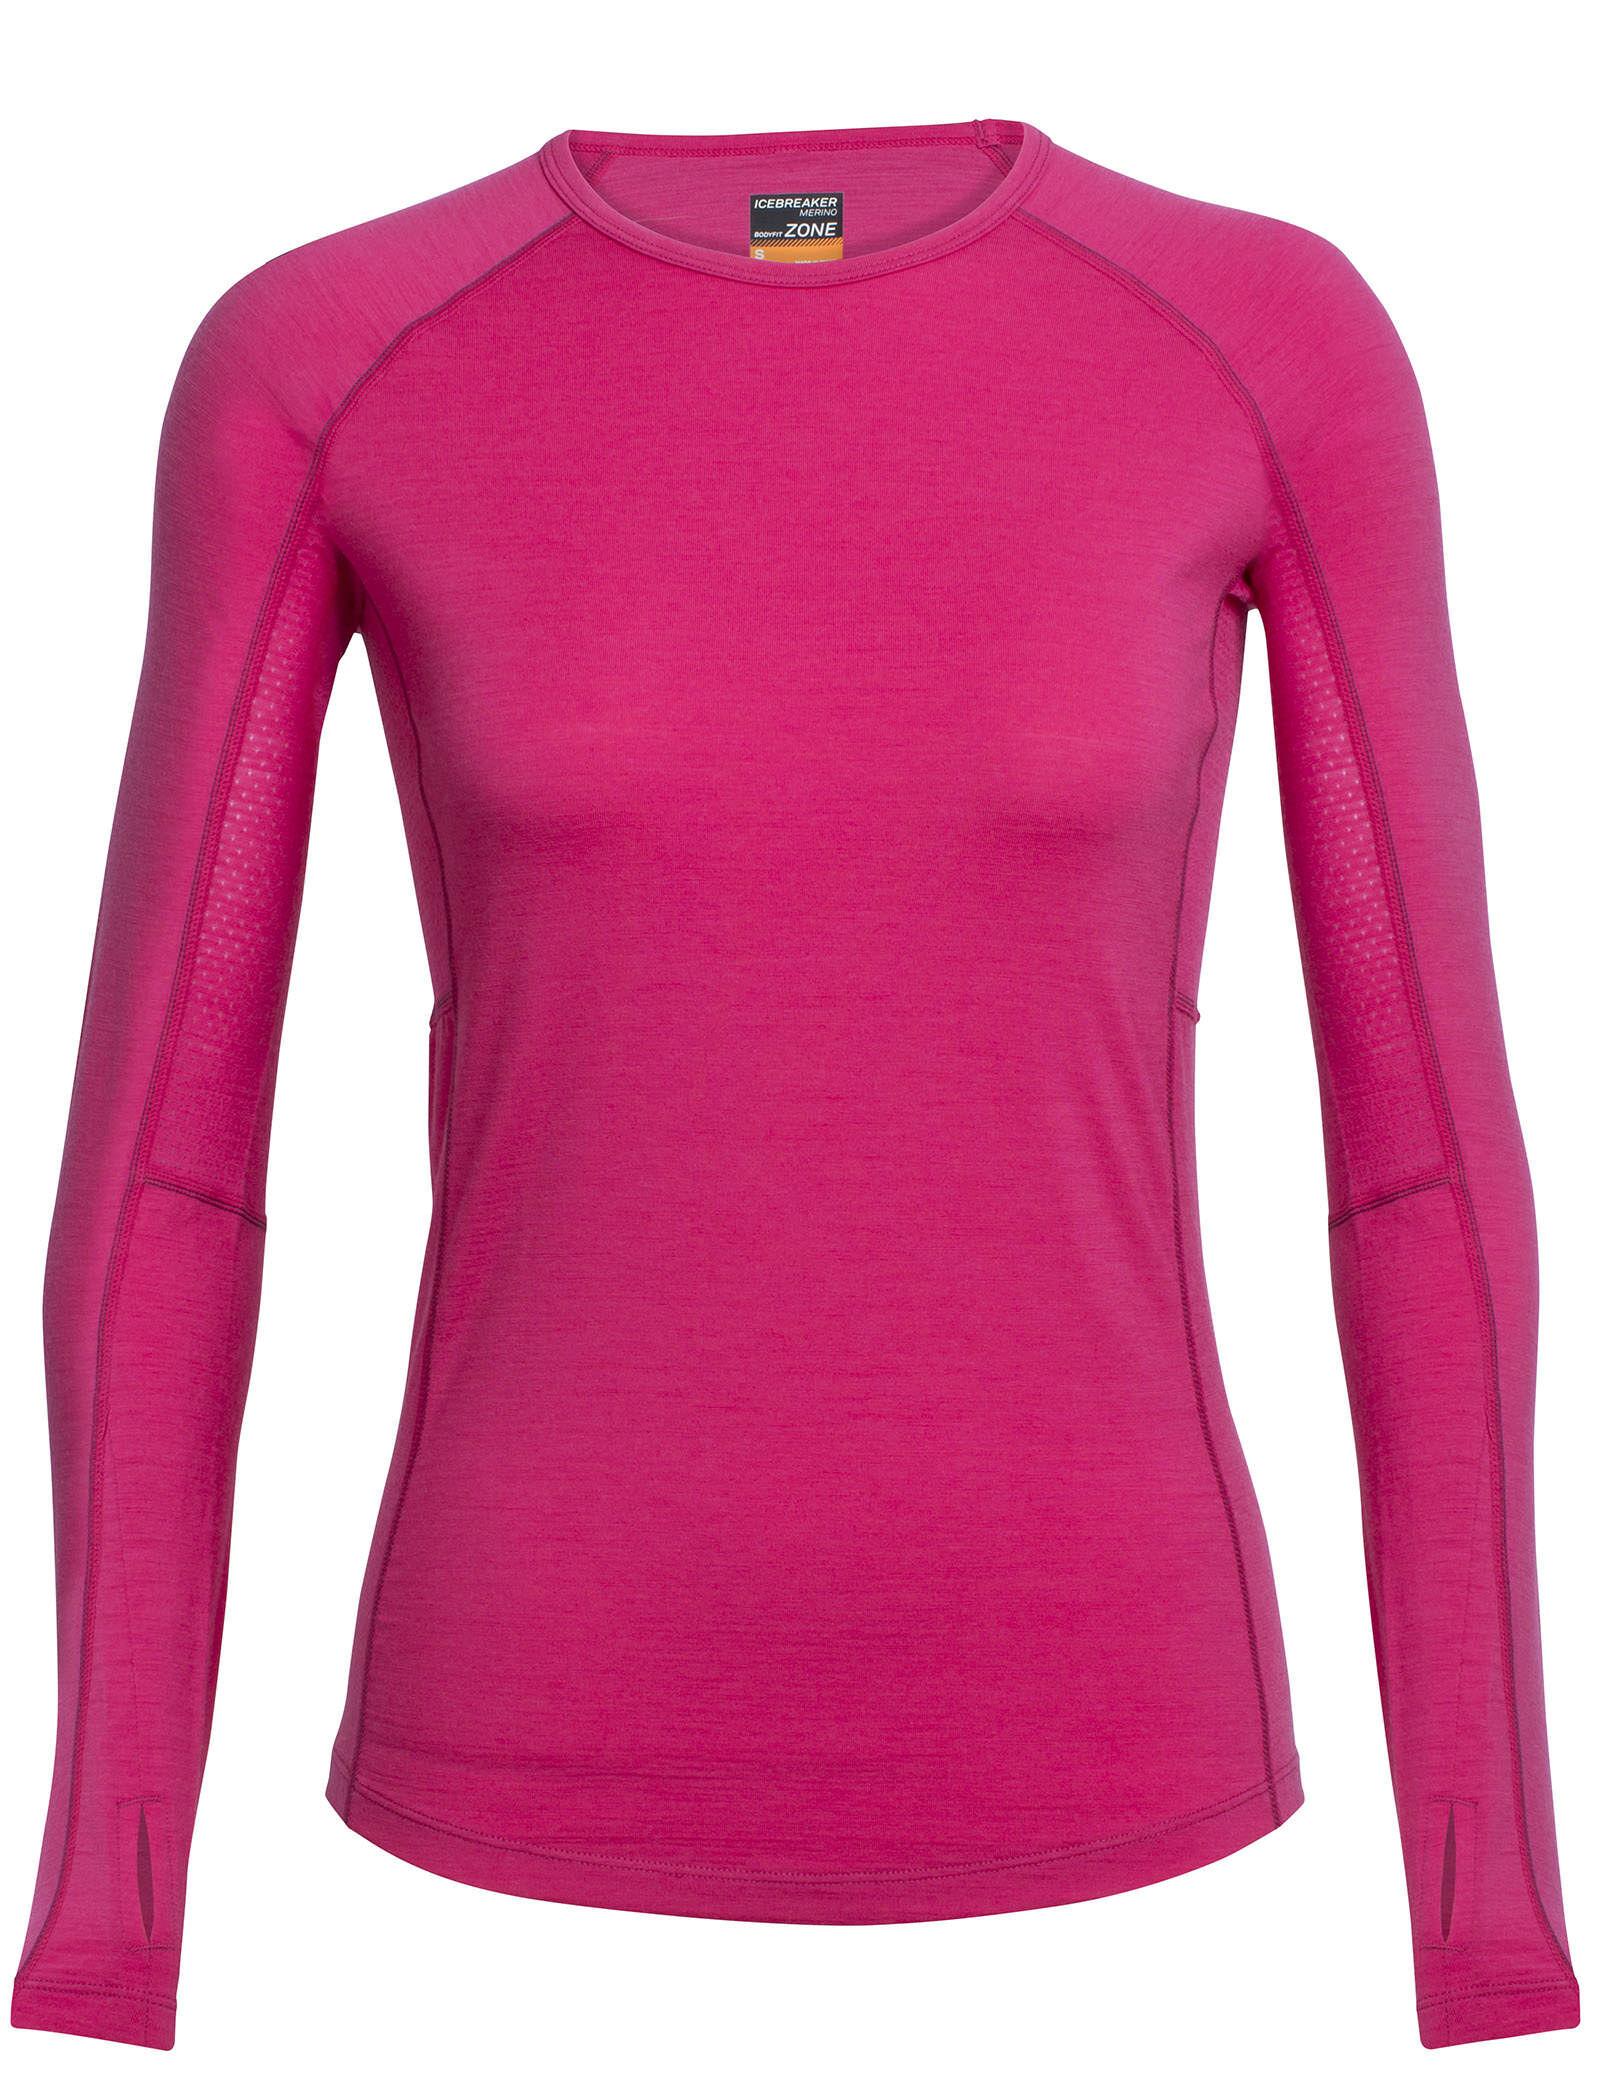 Icebreaker Womens Zone Long Sleeve Crewe T-Shirt